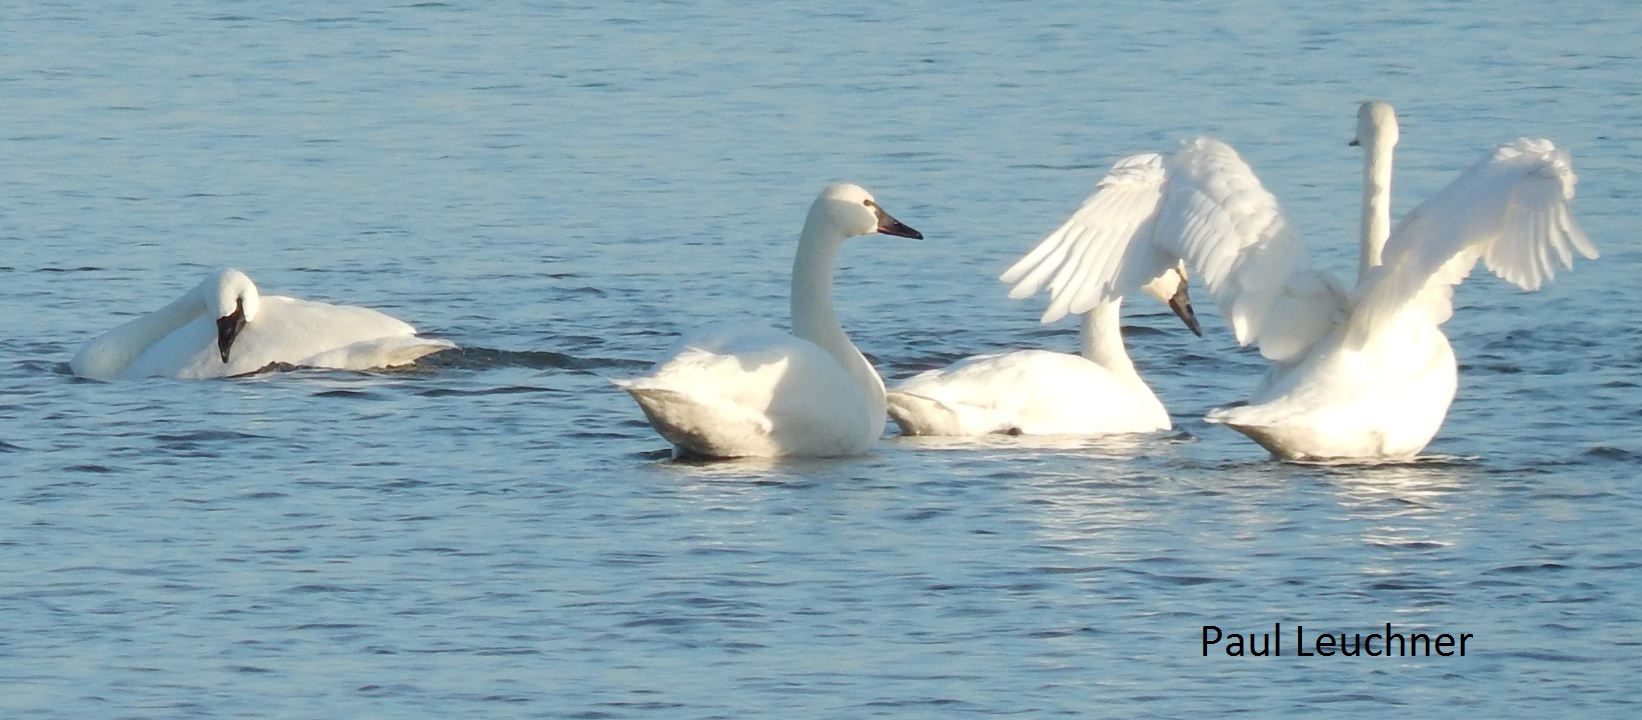 Tundra Swans P Leuchner1